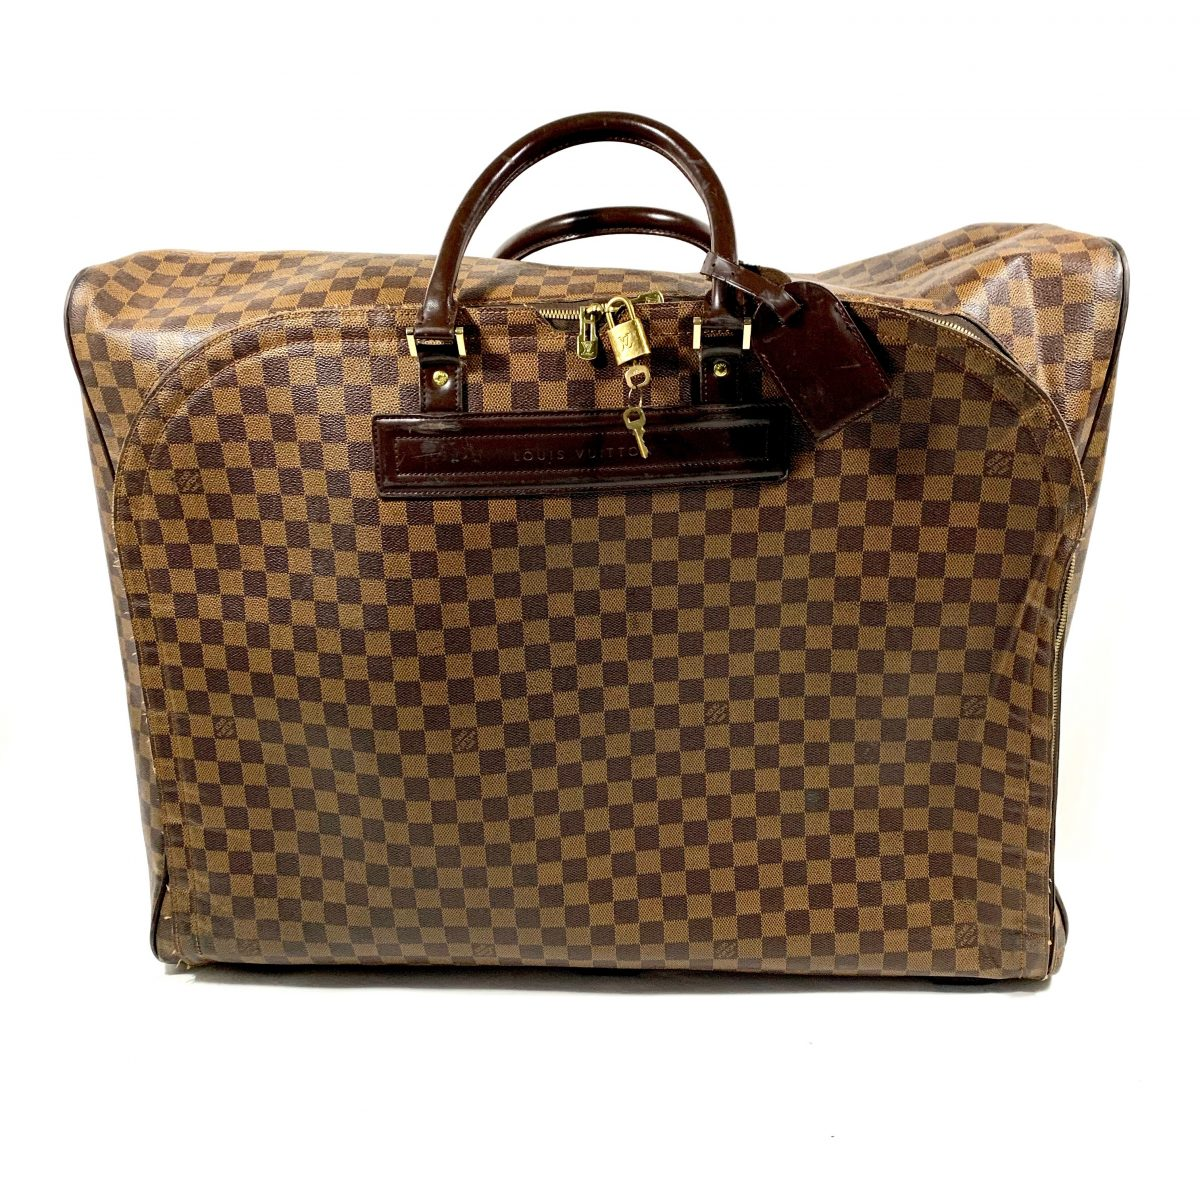 Louis Vuitton designer travel bag